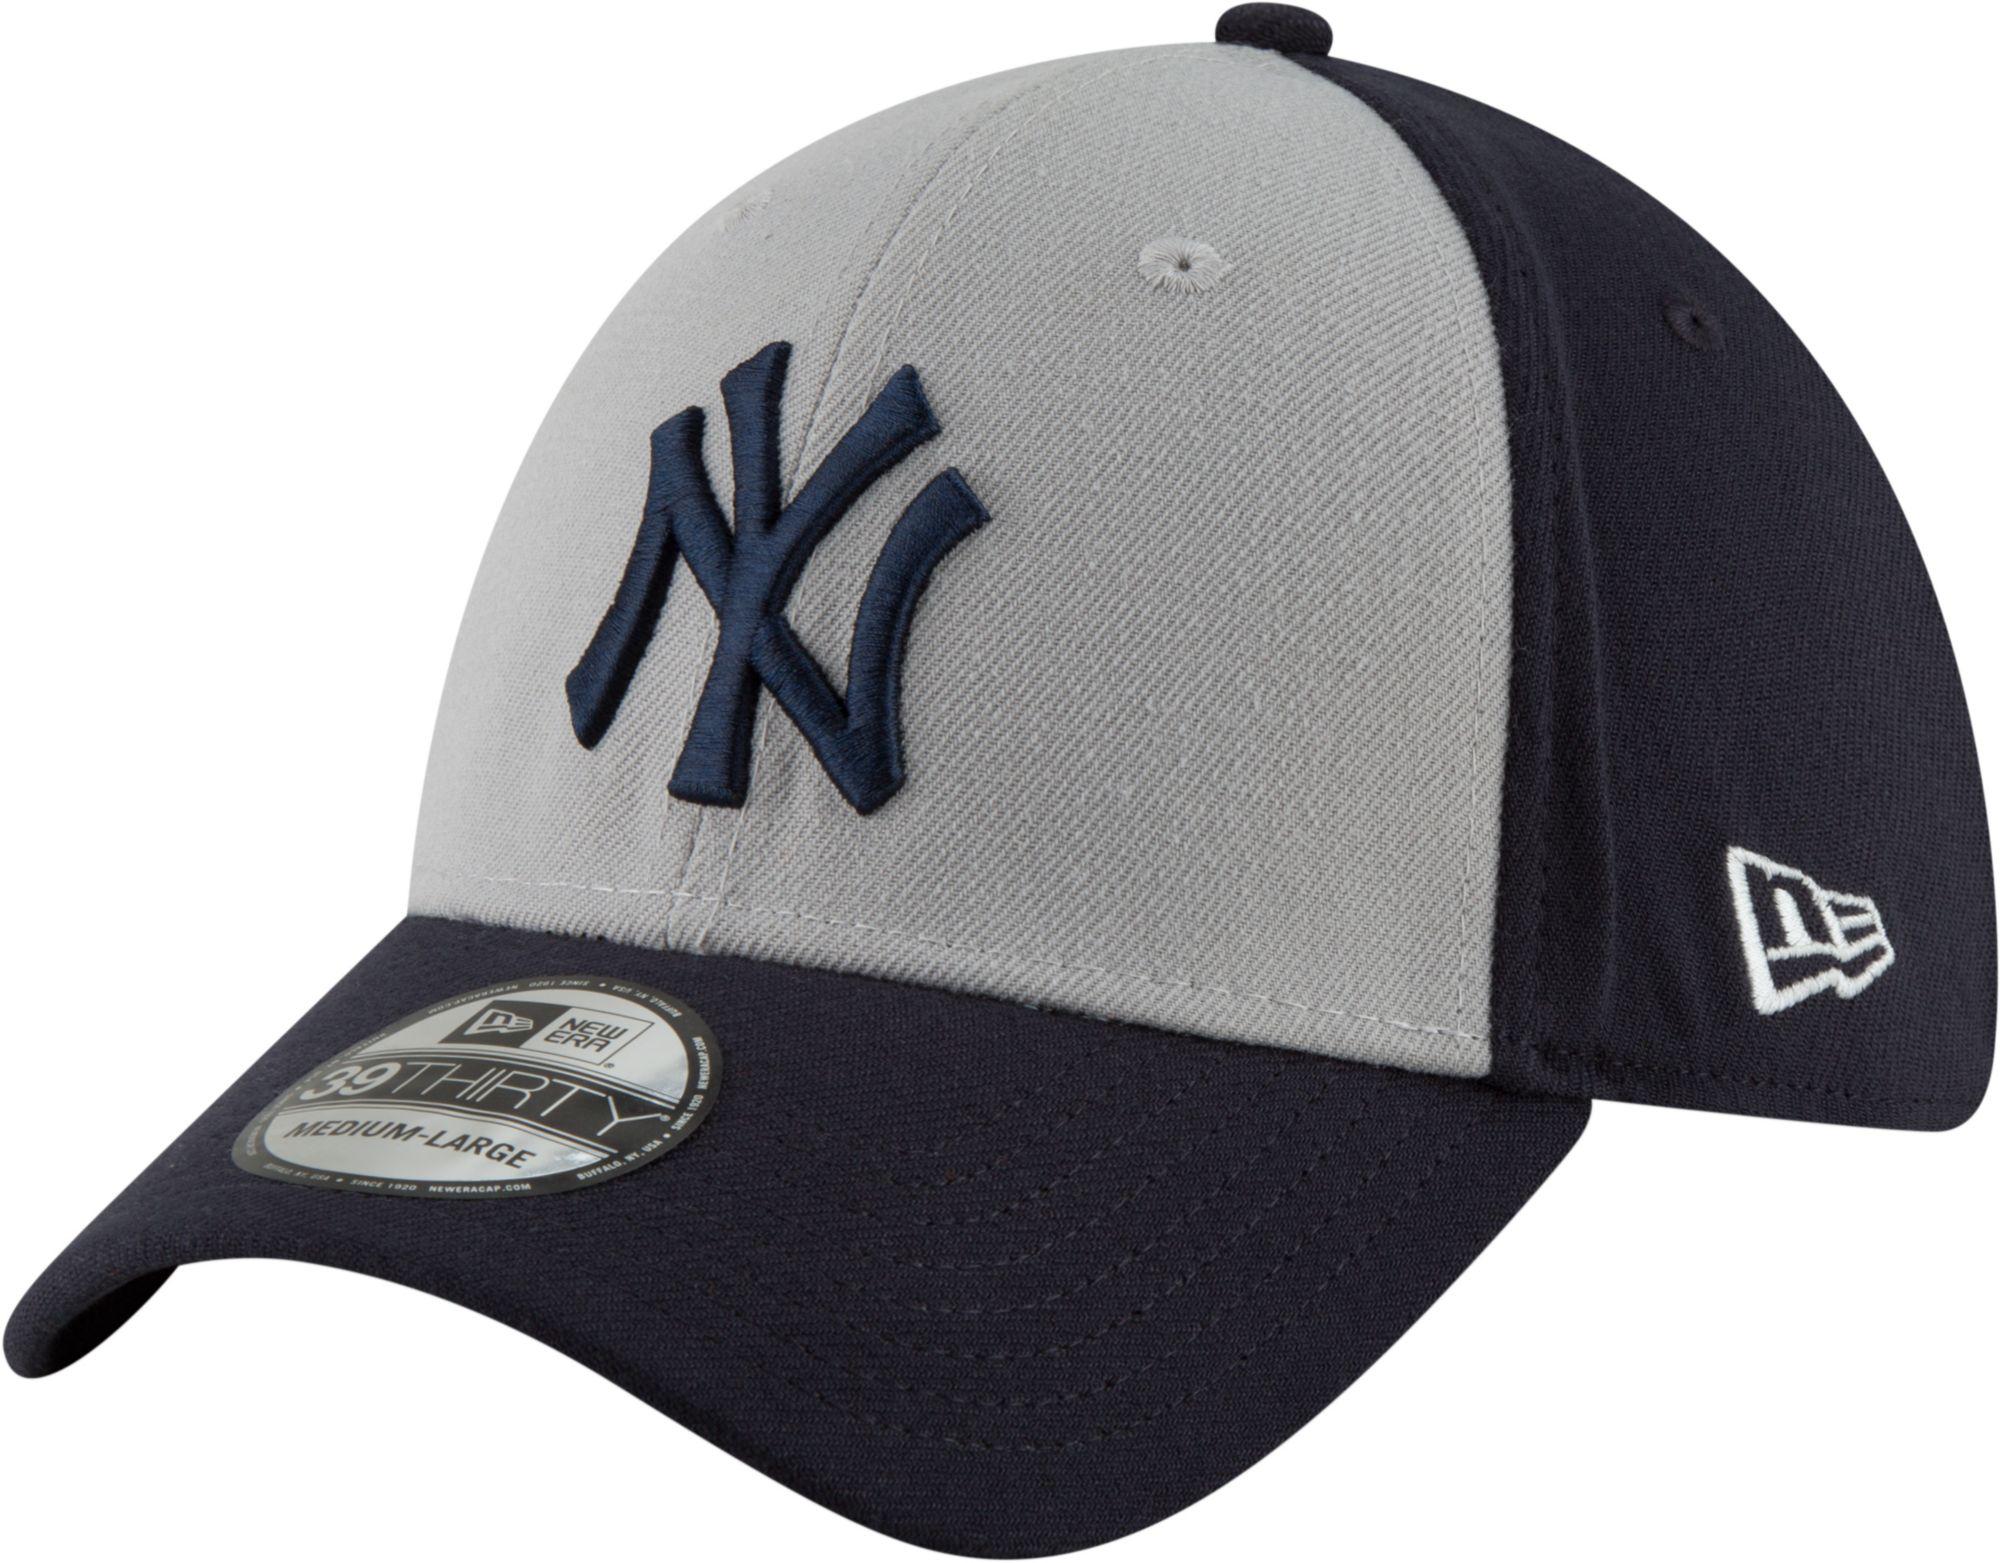 f27a4ec9e1a discount code for mlb hat stretch fit d4fde 075eb